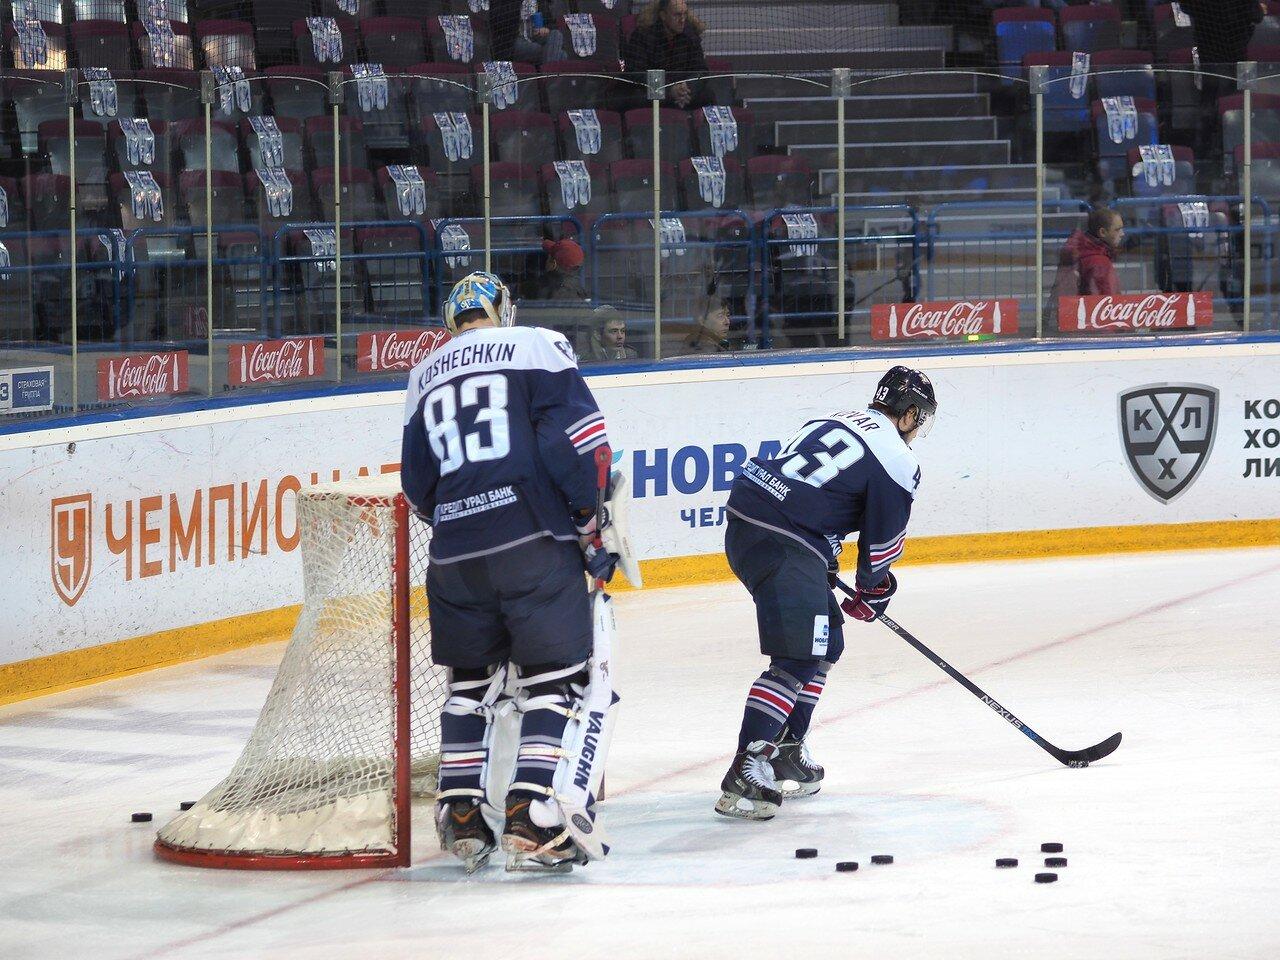 26Плей-офф 2016 Восток Финал Металлург - Салават Юлаев 23.03.2016